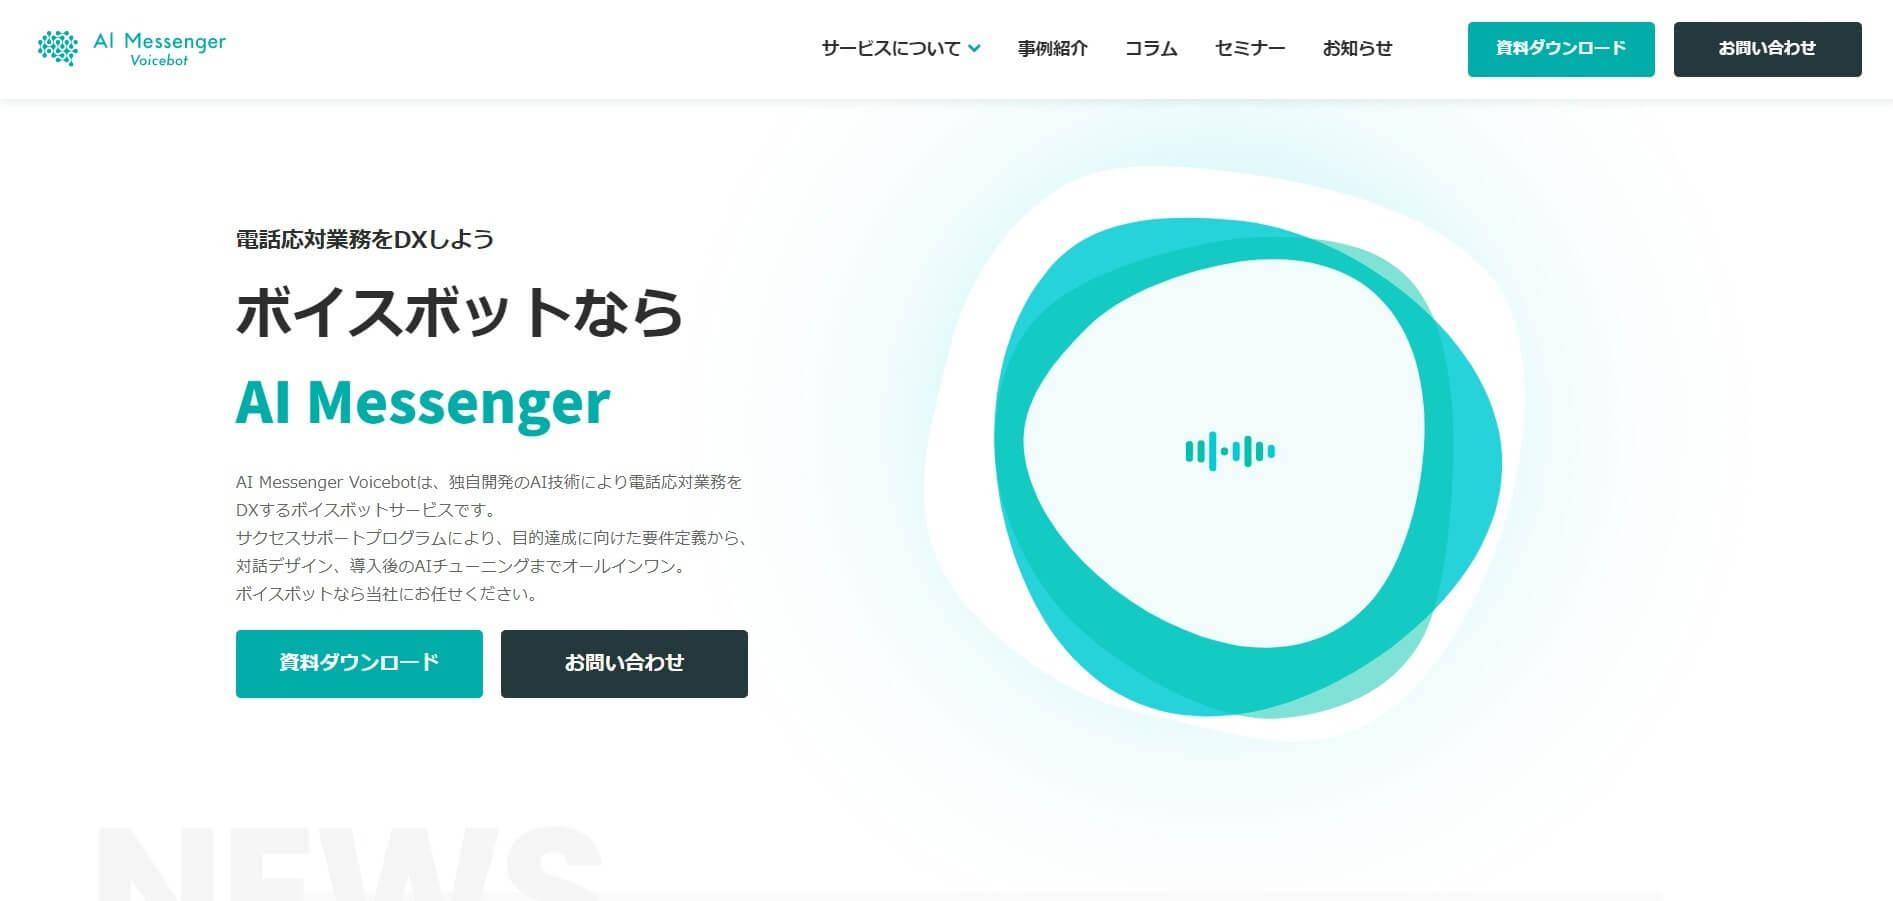 AI Messenger Voicebot